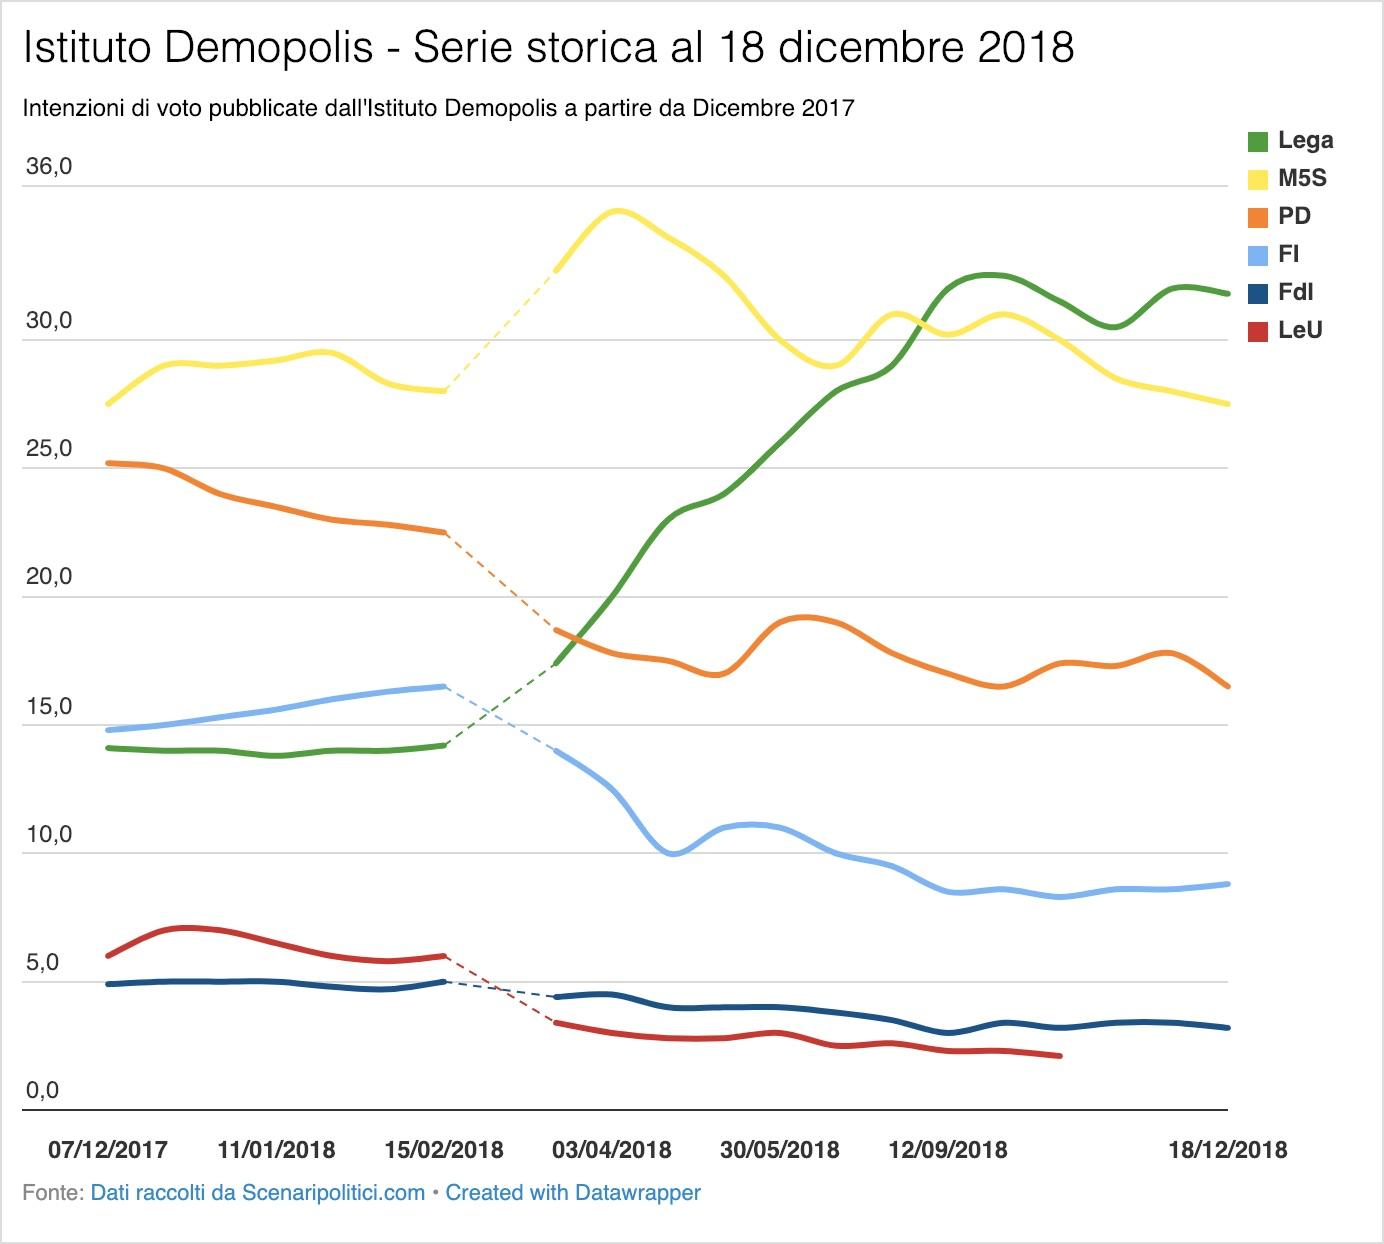 Sondaggio Demopolis 18 dicembre 2018